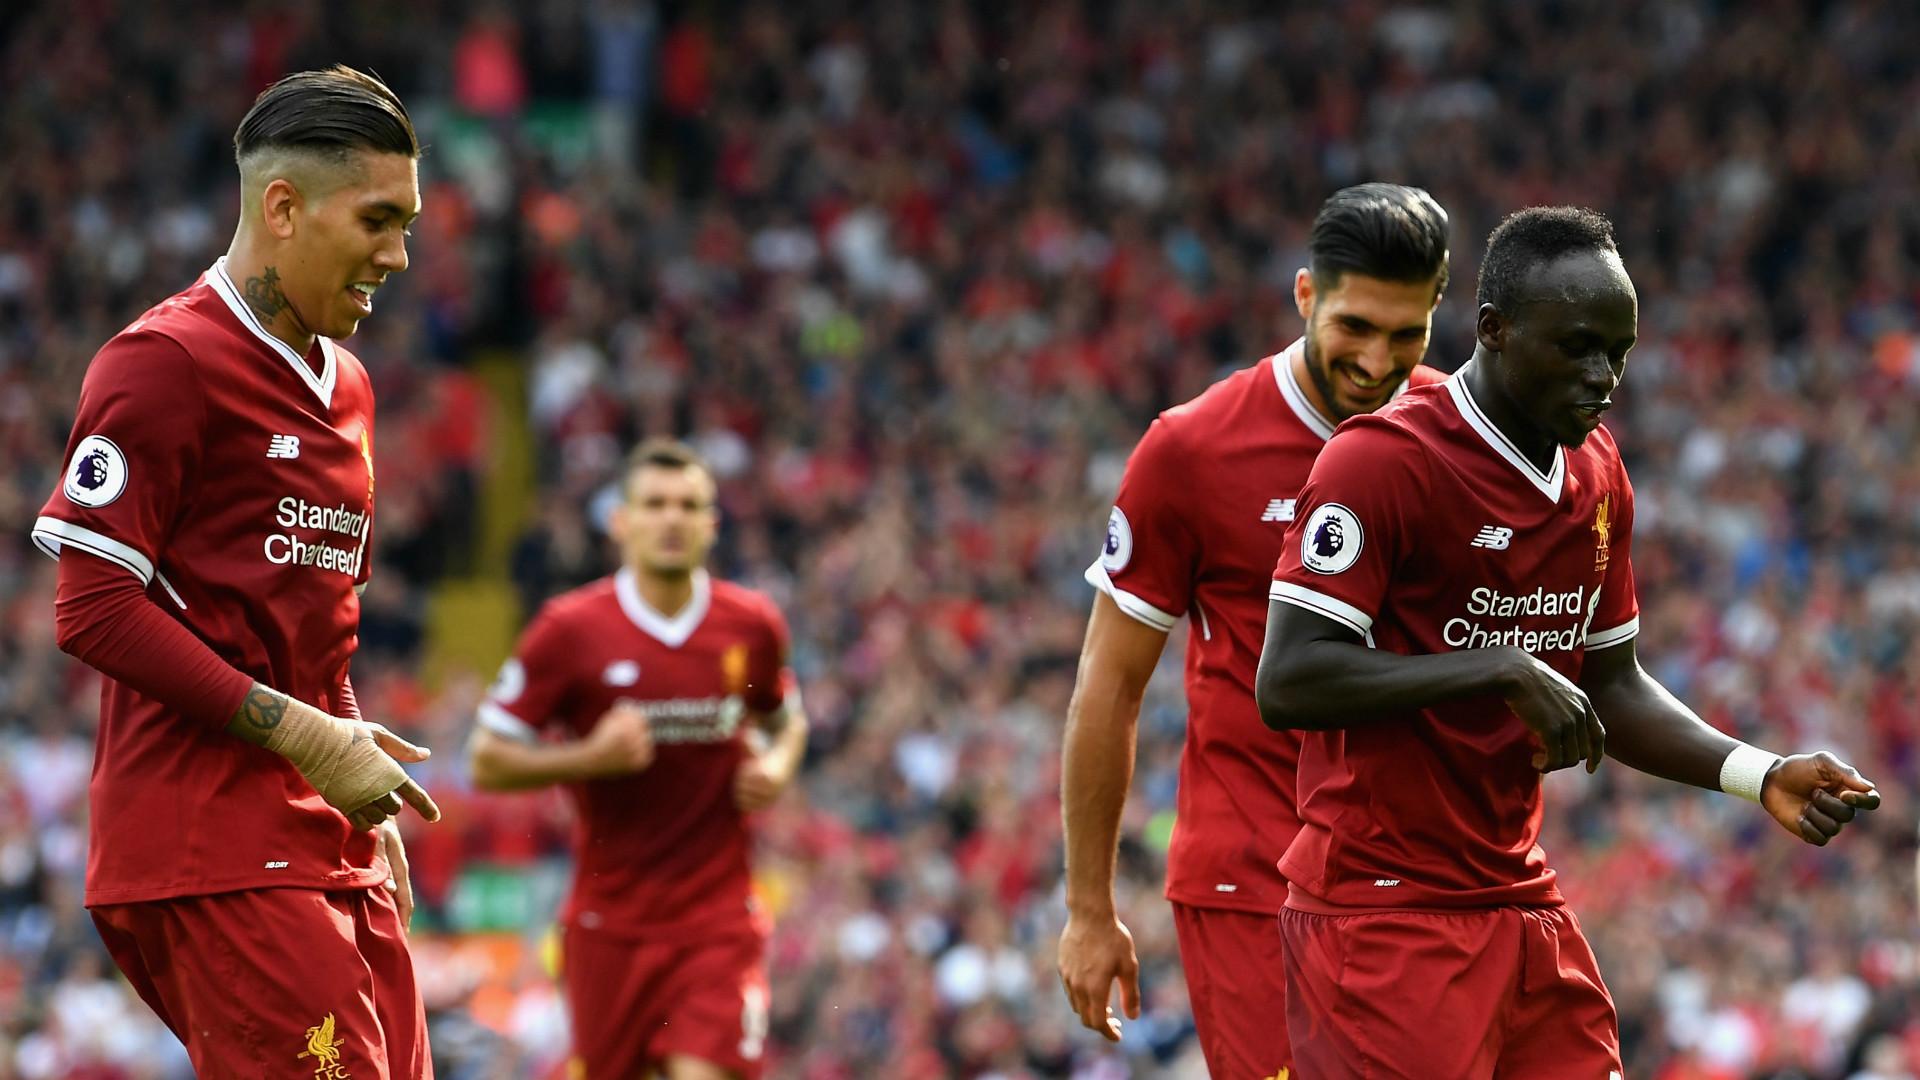 Mane, Firmino And Salah Send Warning To Liverpool's